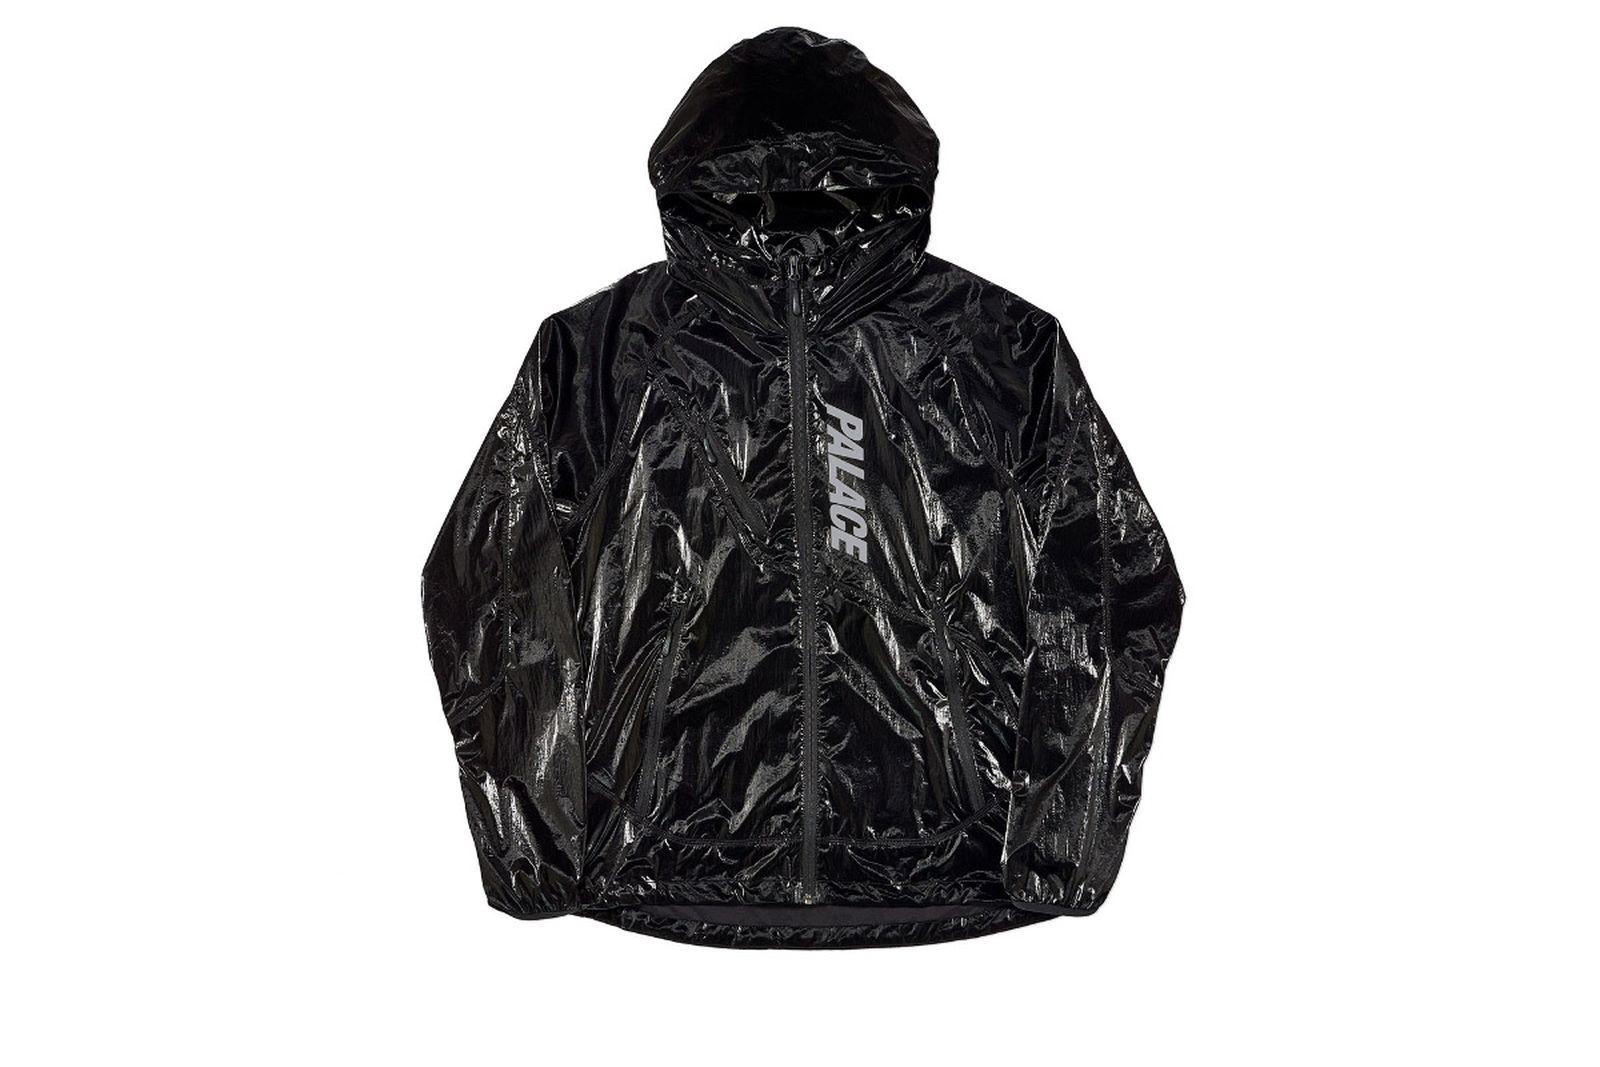 Palace 2019 Autumn Jacket G Loss Jacket black front fw19